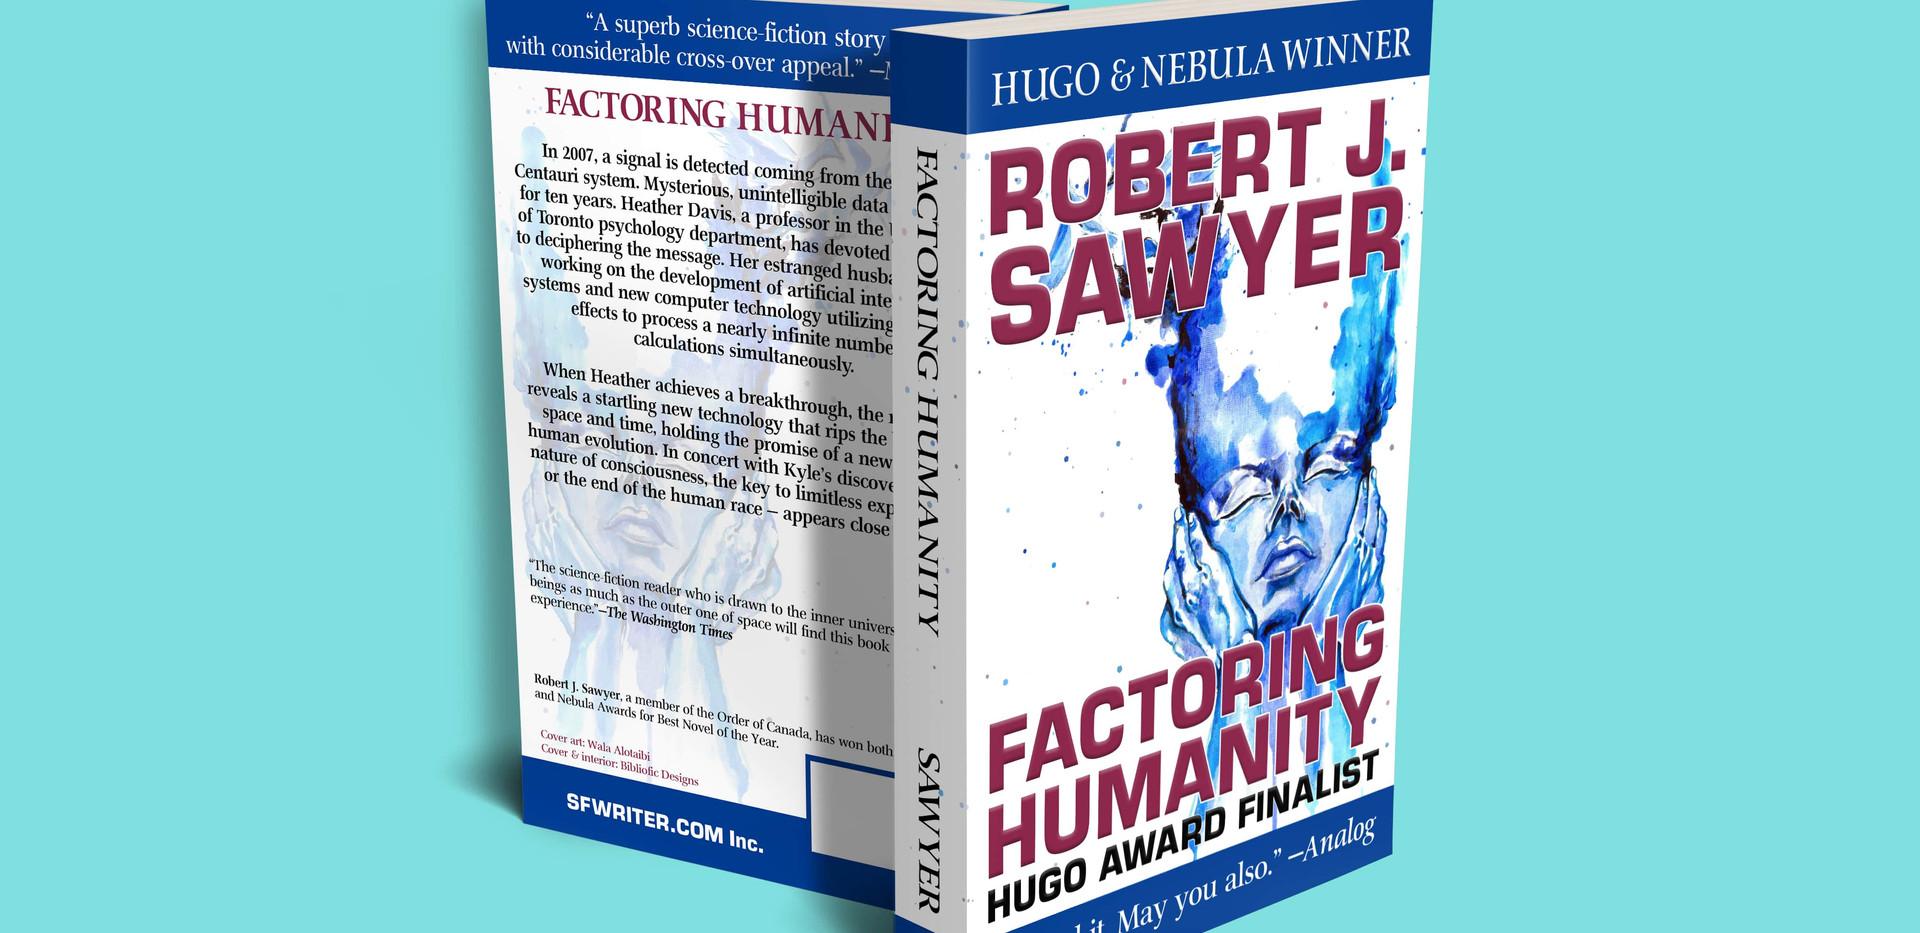 Factoring Humanity by Robert J. Sawyer